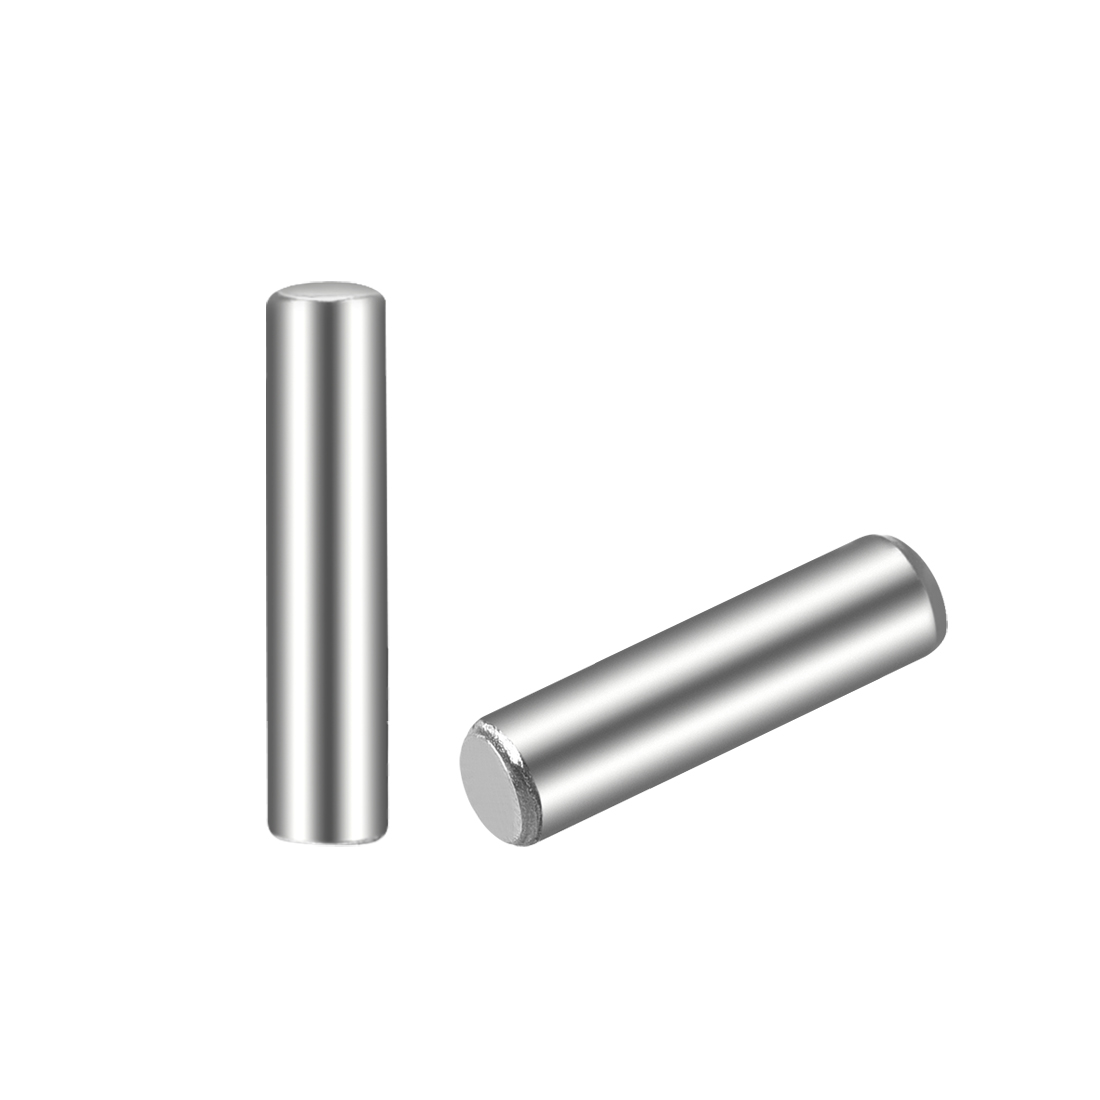 50Pcs 2.5mm x 12mm Dowel Pin 304 Stainless Steel Shelf Support Pin Fasten